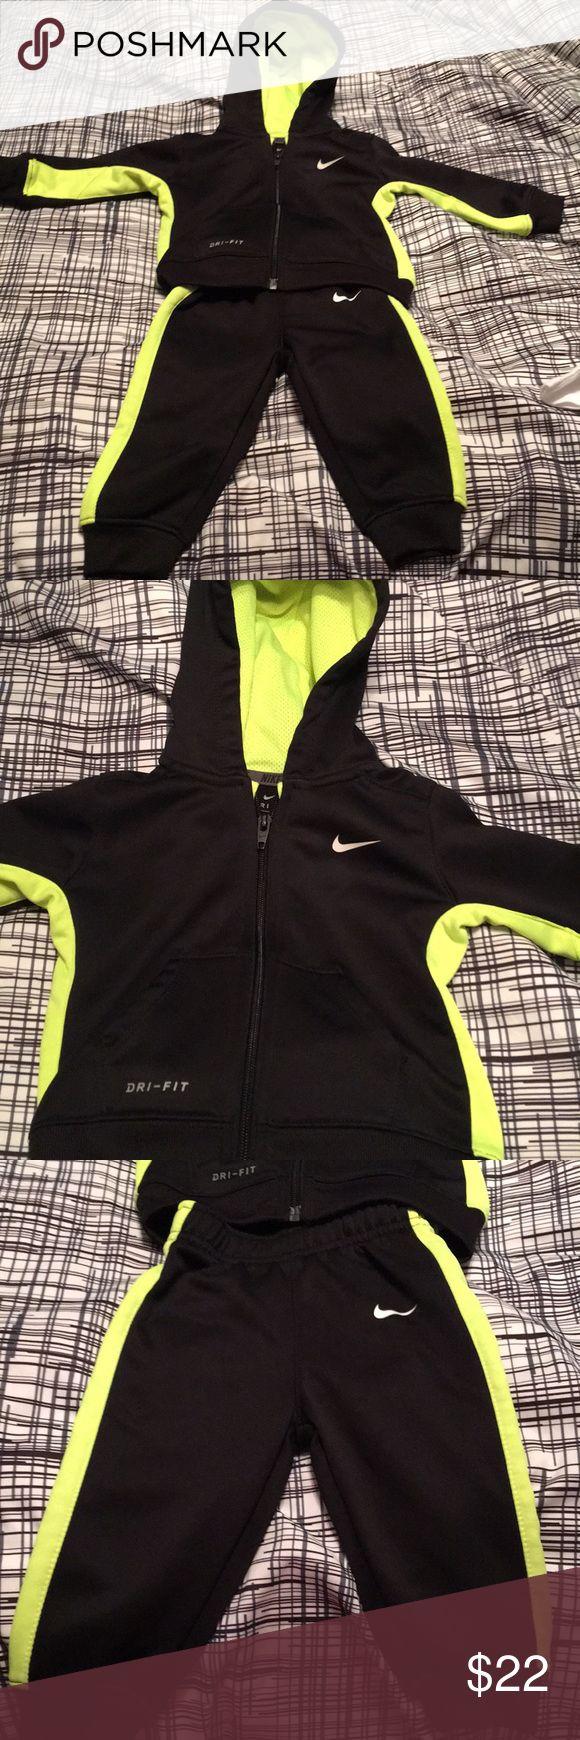 Best 25+ Nike sweat suits ideas on Pinterest   Nike style ...